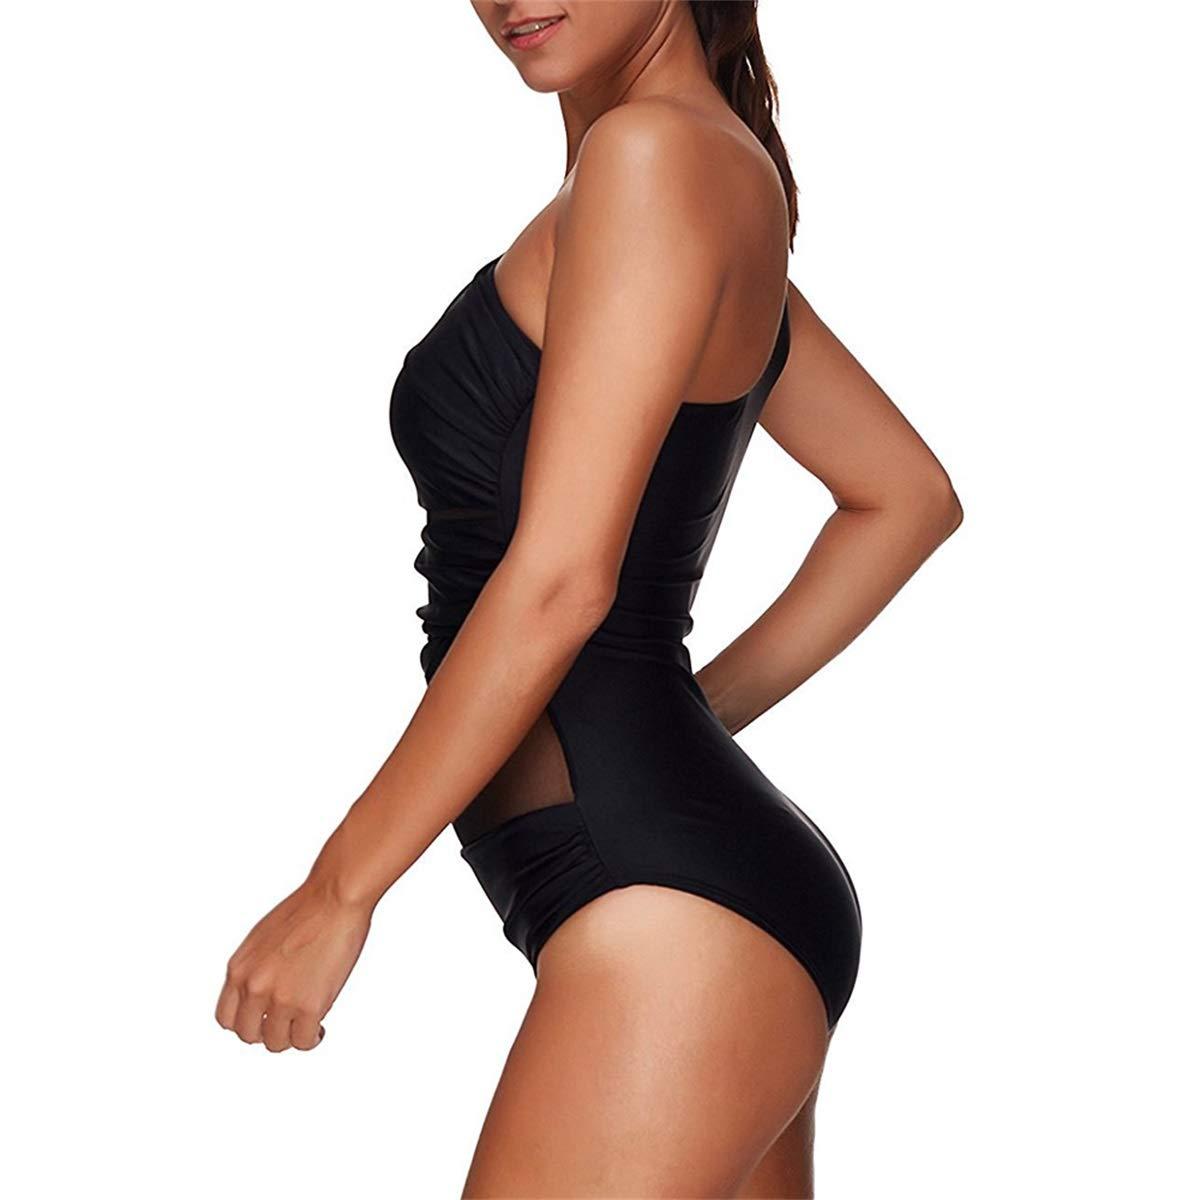 heekpek Traje de Ba/ño Mujeres Hombro Sin Respaldo Monokini Beach Fashion con Gasa Bikini Talla Grande Cintura de Malla Beachwear para Mujer